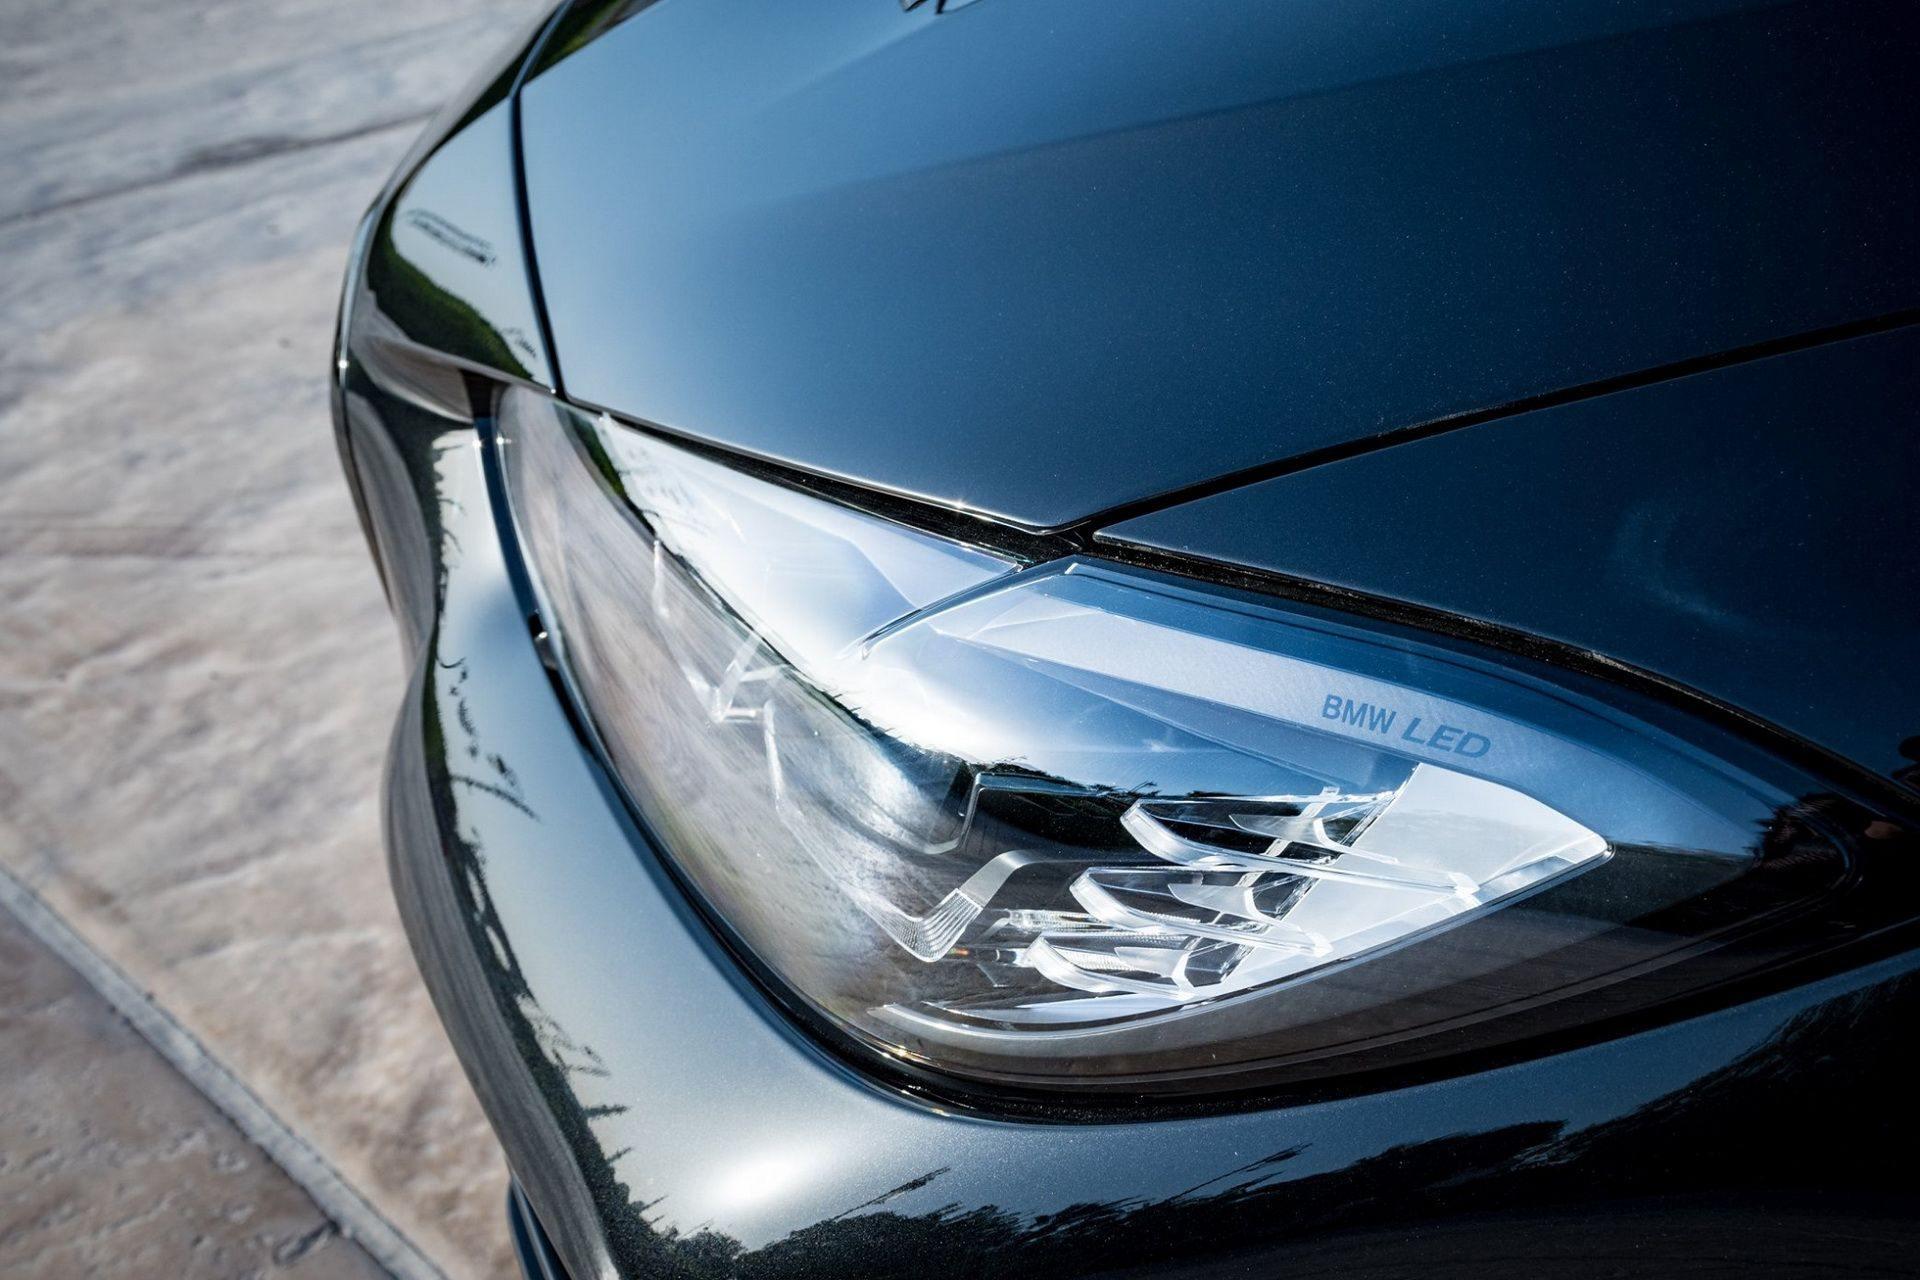 2021_BMW_4-Series_Coupe_Dark_Edition_UAE_0010